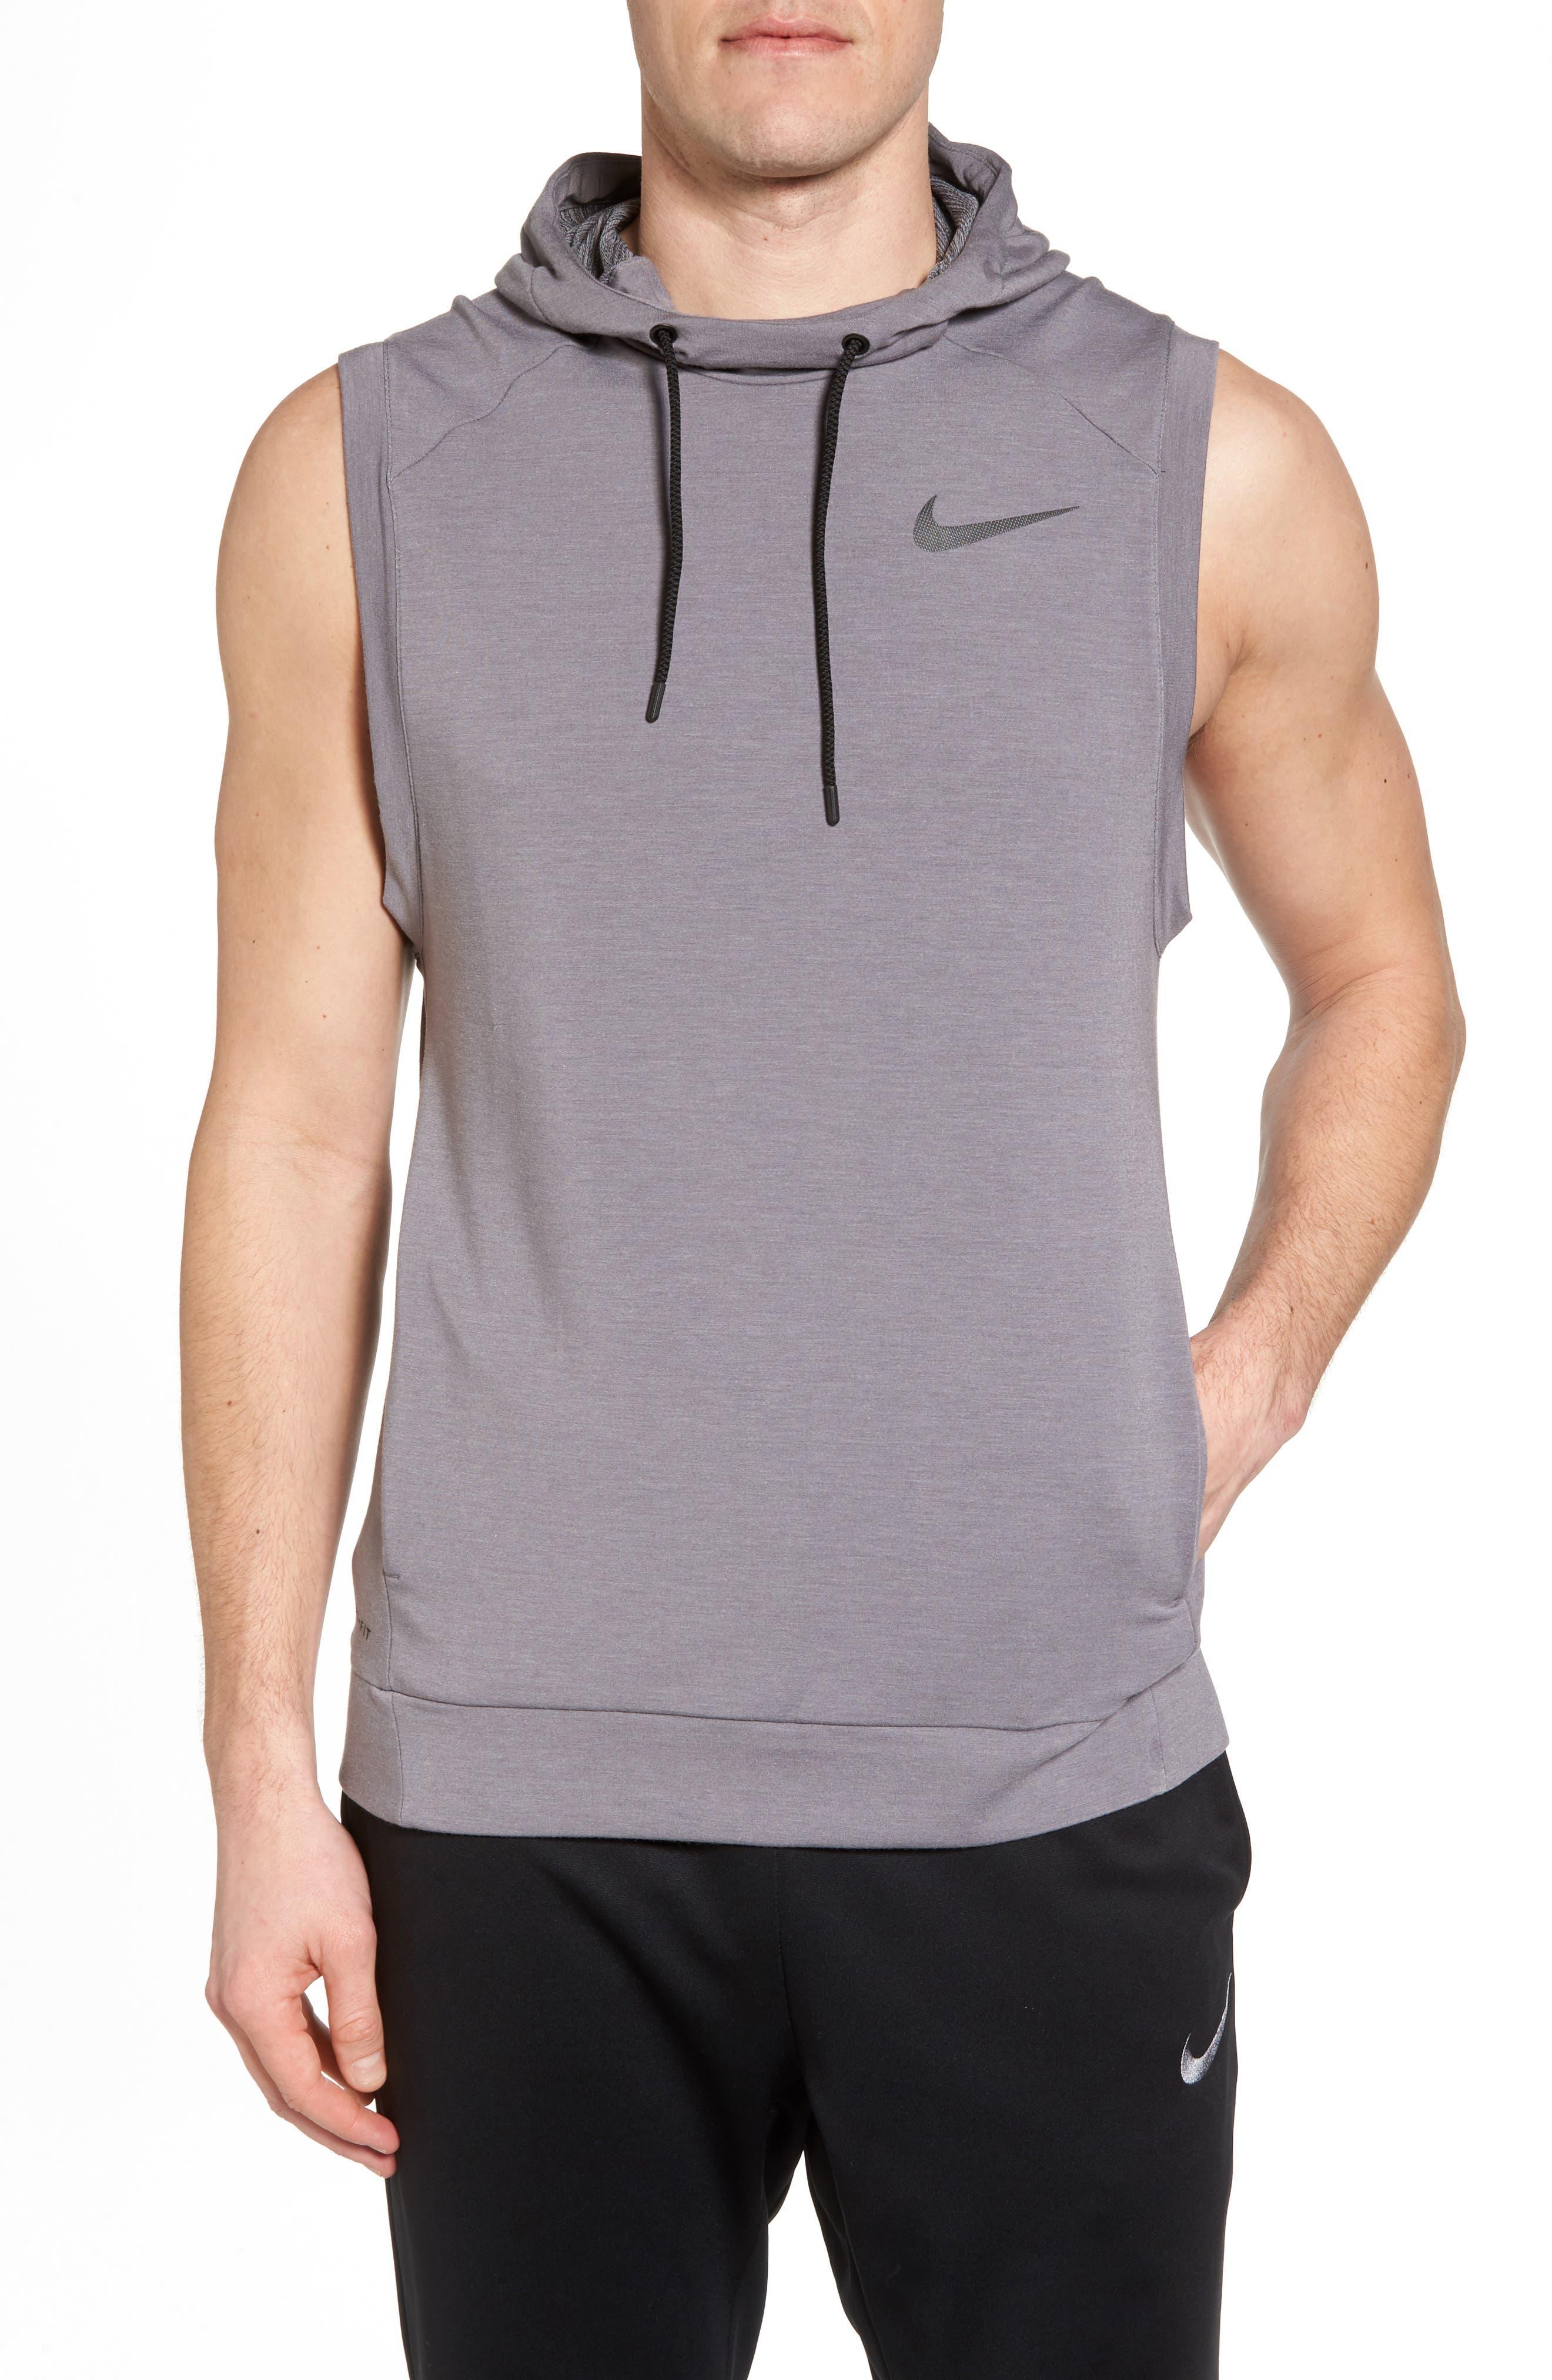 Alternate Image 1 Selected - Nike Dry Training Day Sleeveless Hoodie